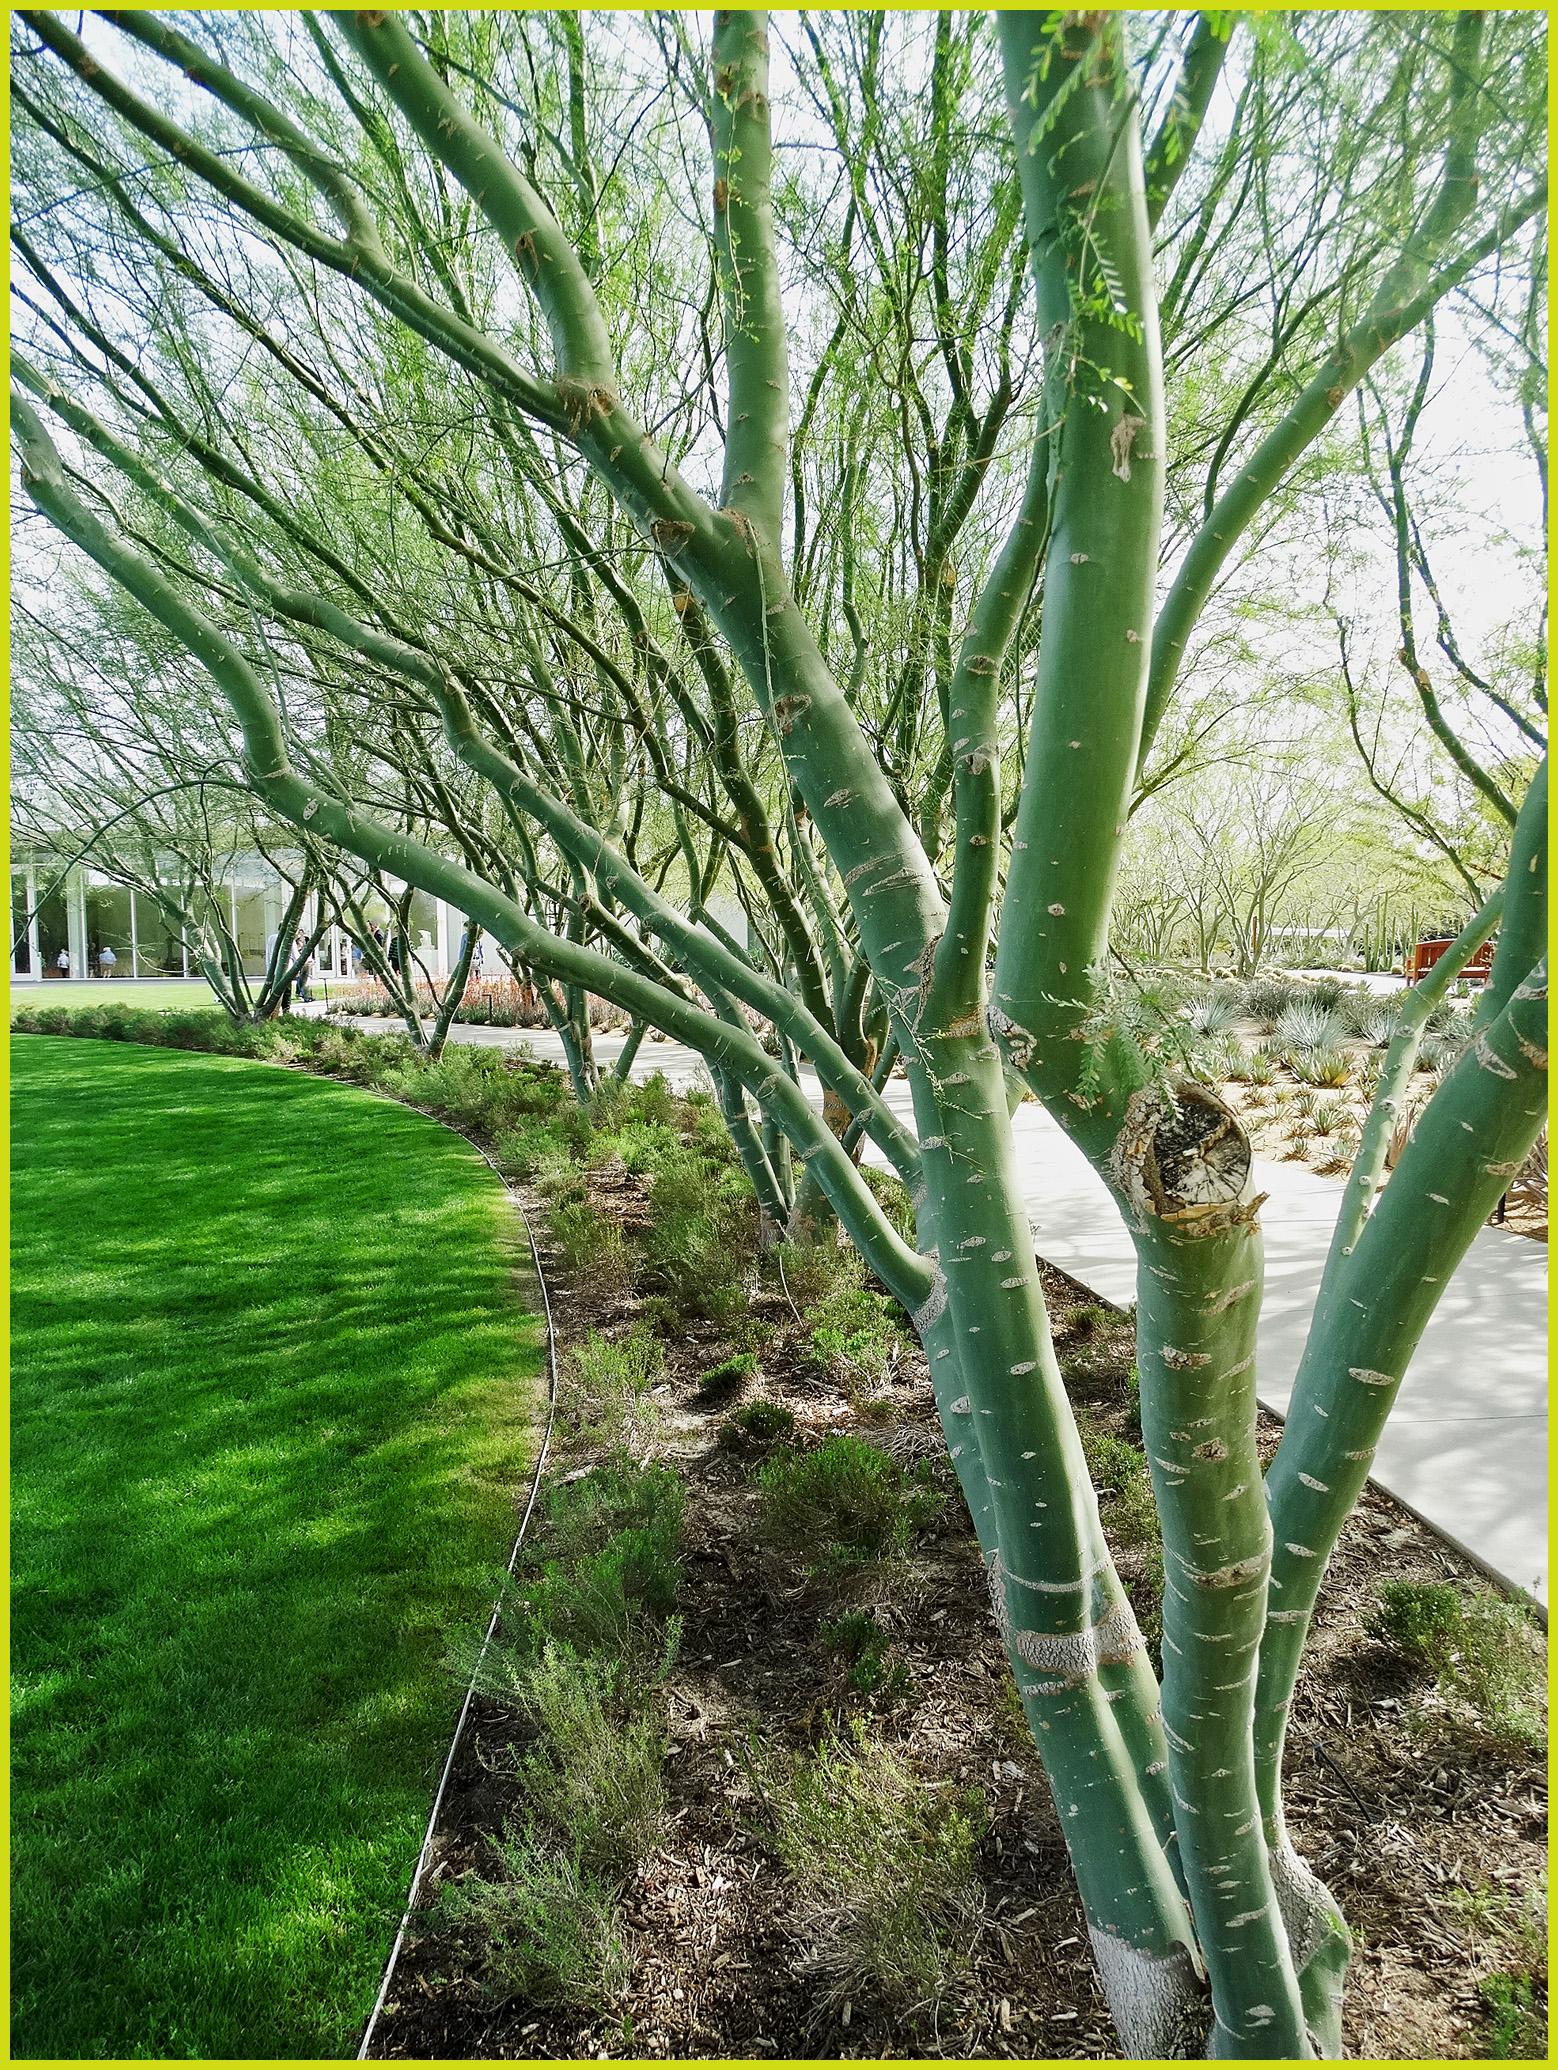 file palo verde trees 2 22 14a 12935881964 jpg wikimedia commons